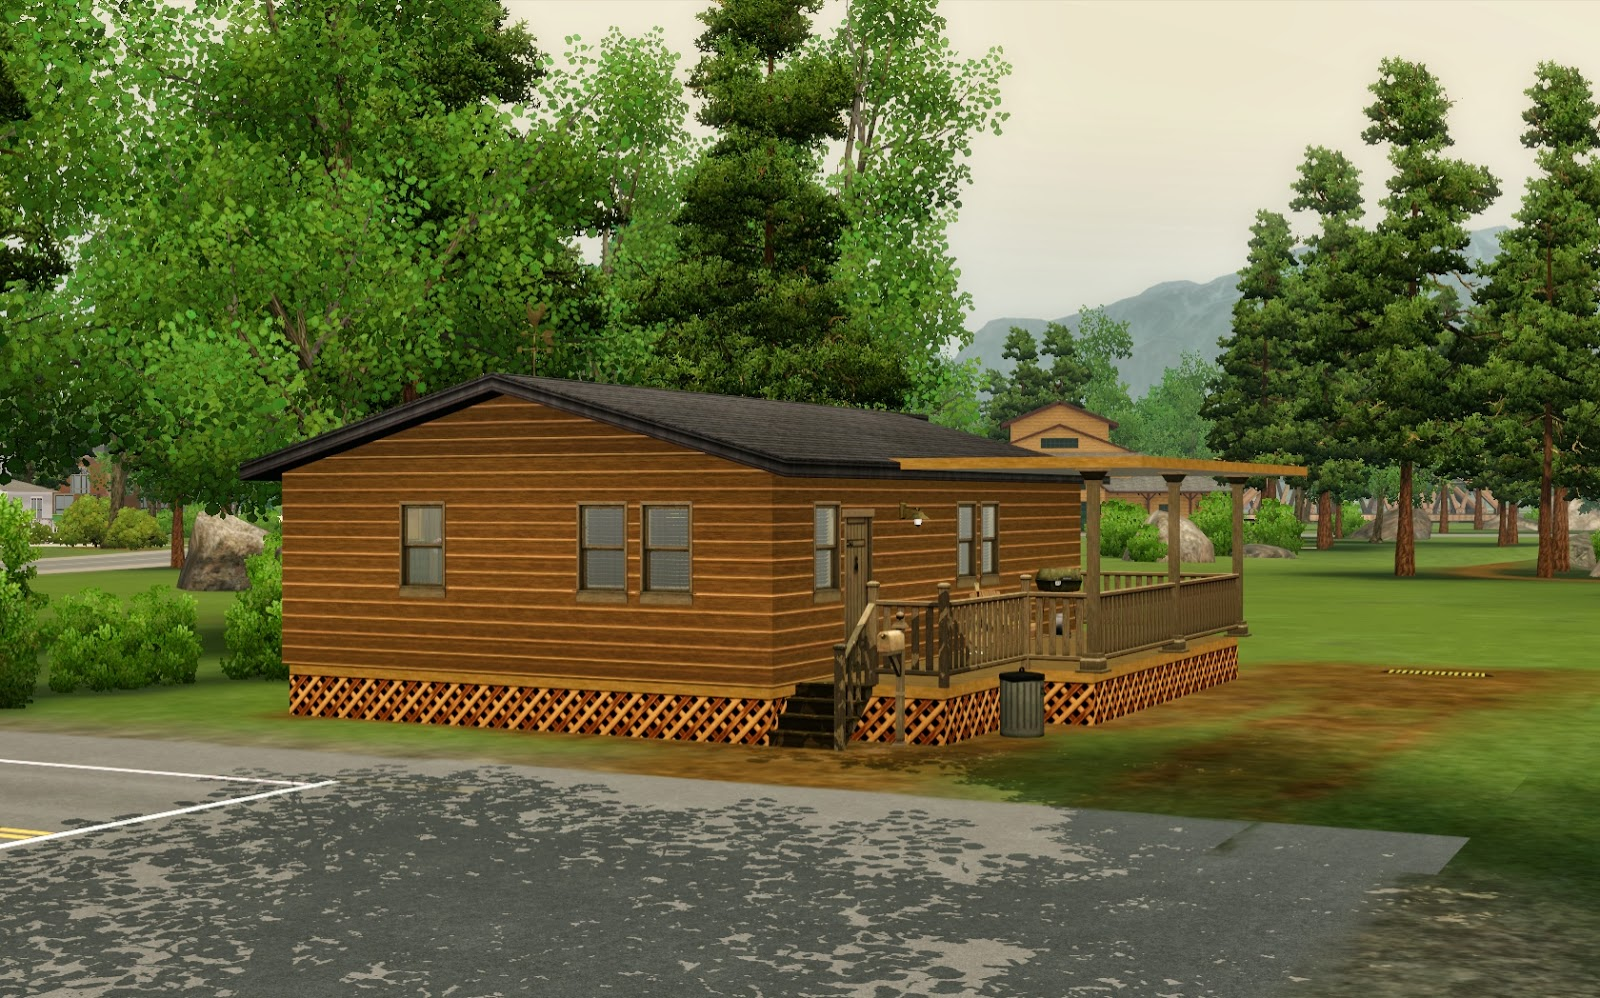 Summer's Little Sims 3 Garden: Moonlight Falls (The Sims 3 ... on